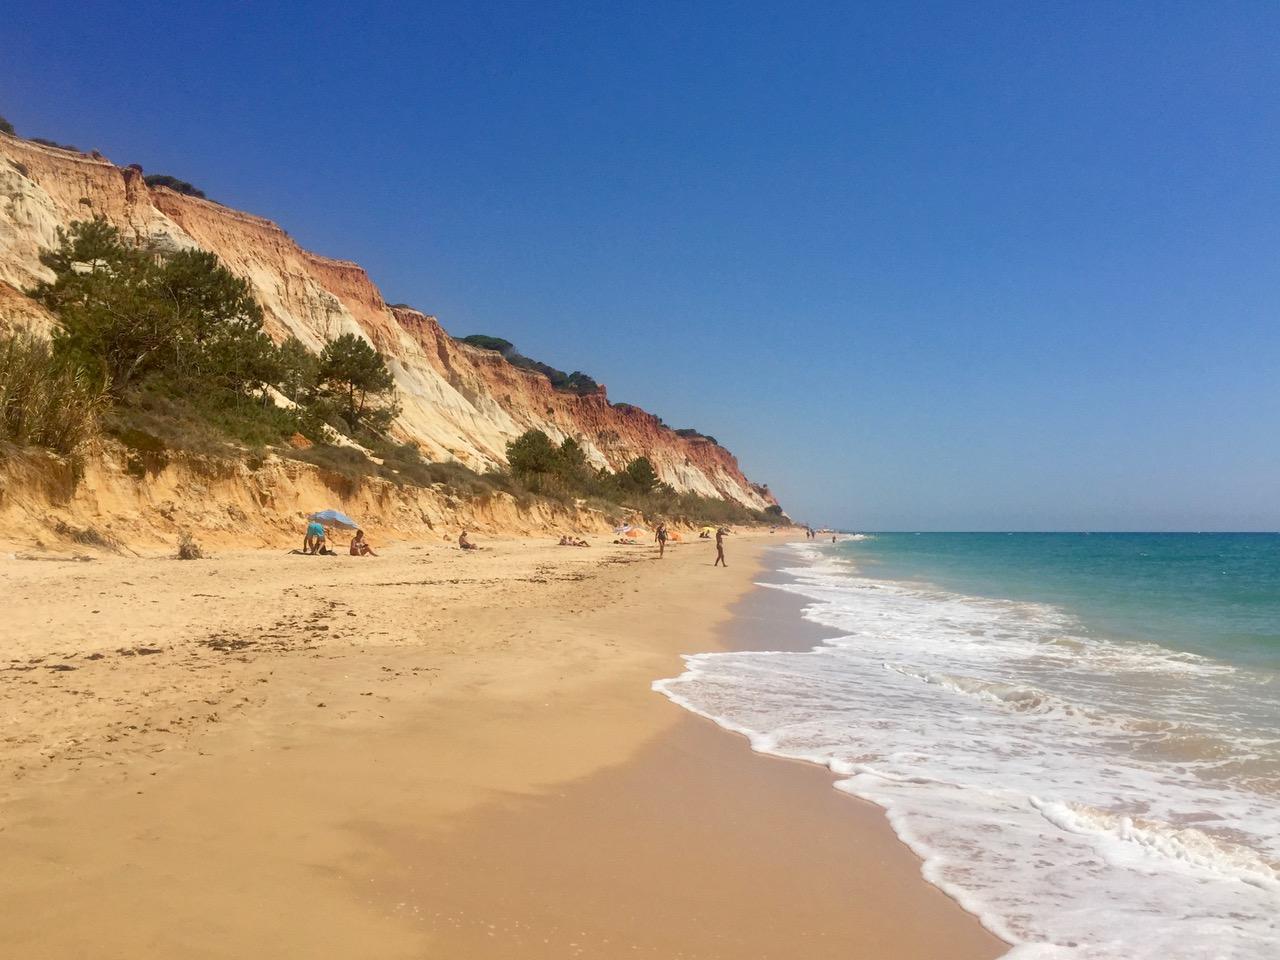 Pine Cliffs beach, Algarve, Portugal